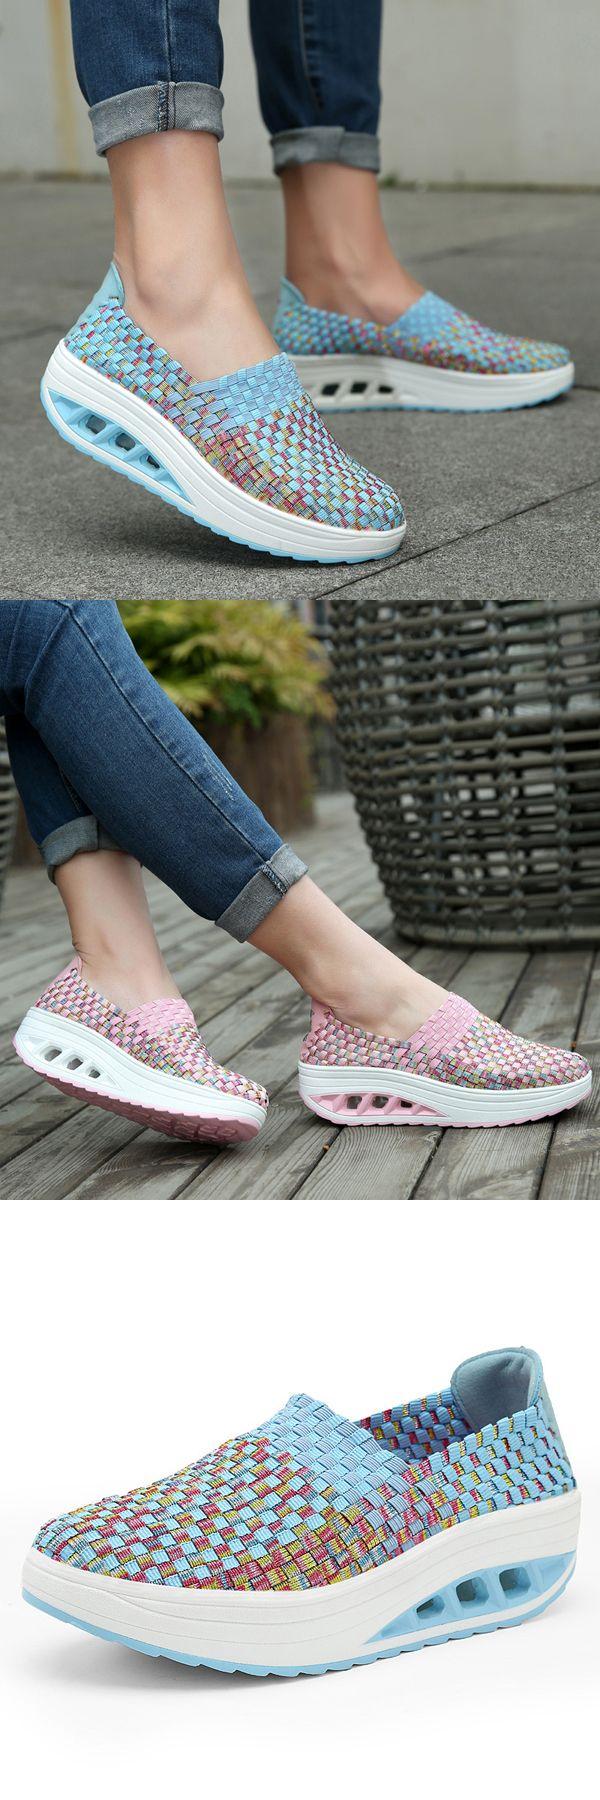 Best 25+ D rose shoes ideas on Pinterest | Rose gold shoes, Gold ...